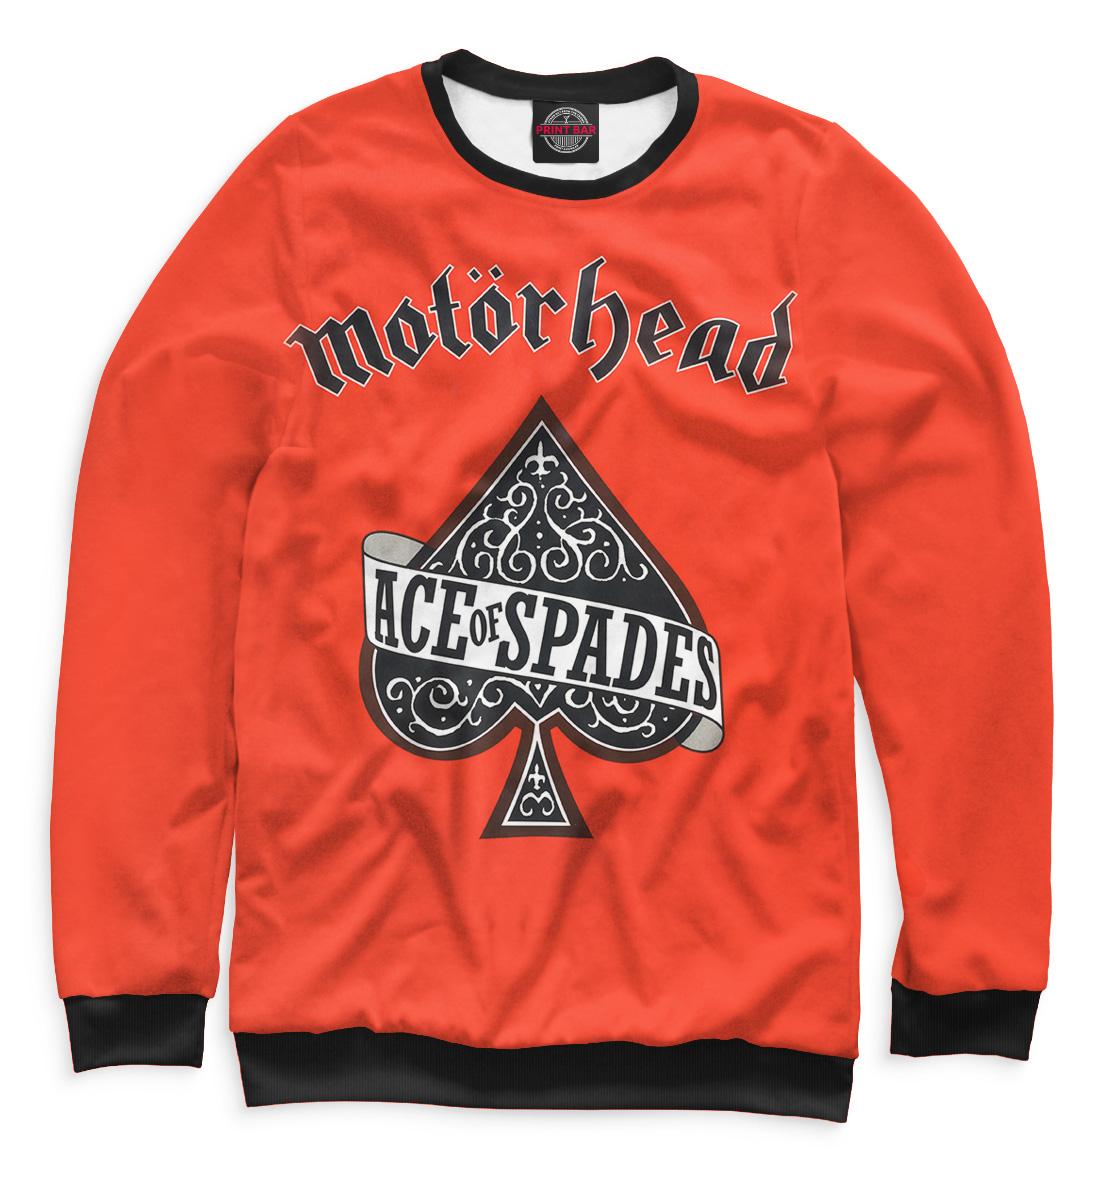 Купить Motorhead, Printbar, Свитшоты, MOT-113945-swi-1